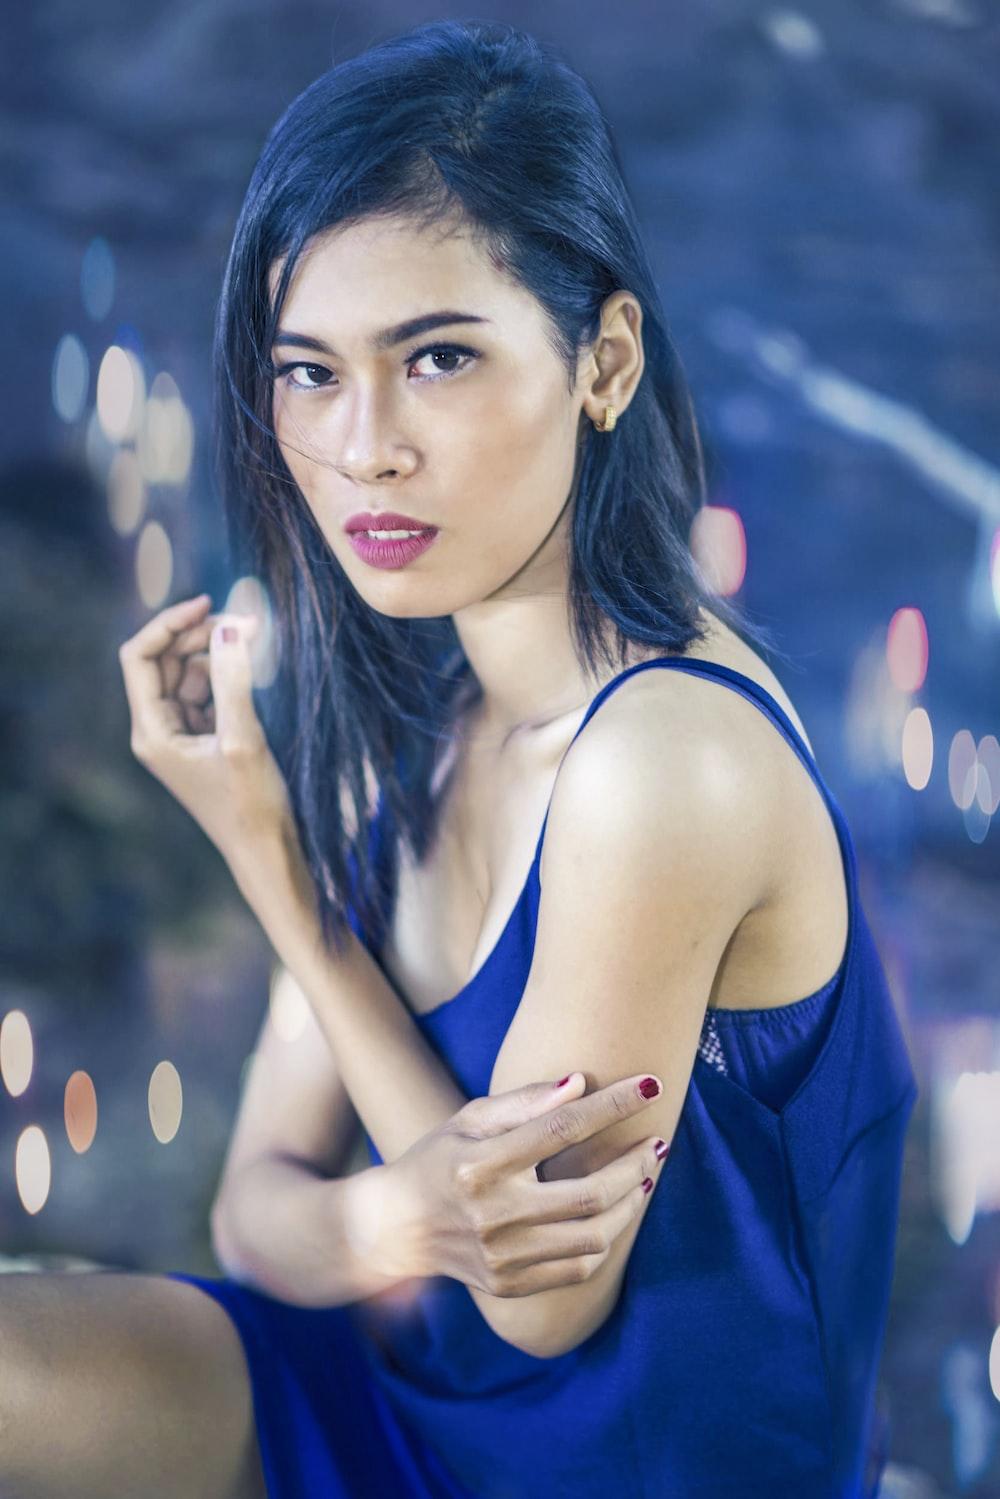 woman in blue spaghetti strap top bokeh photography